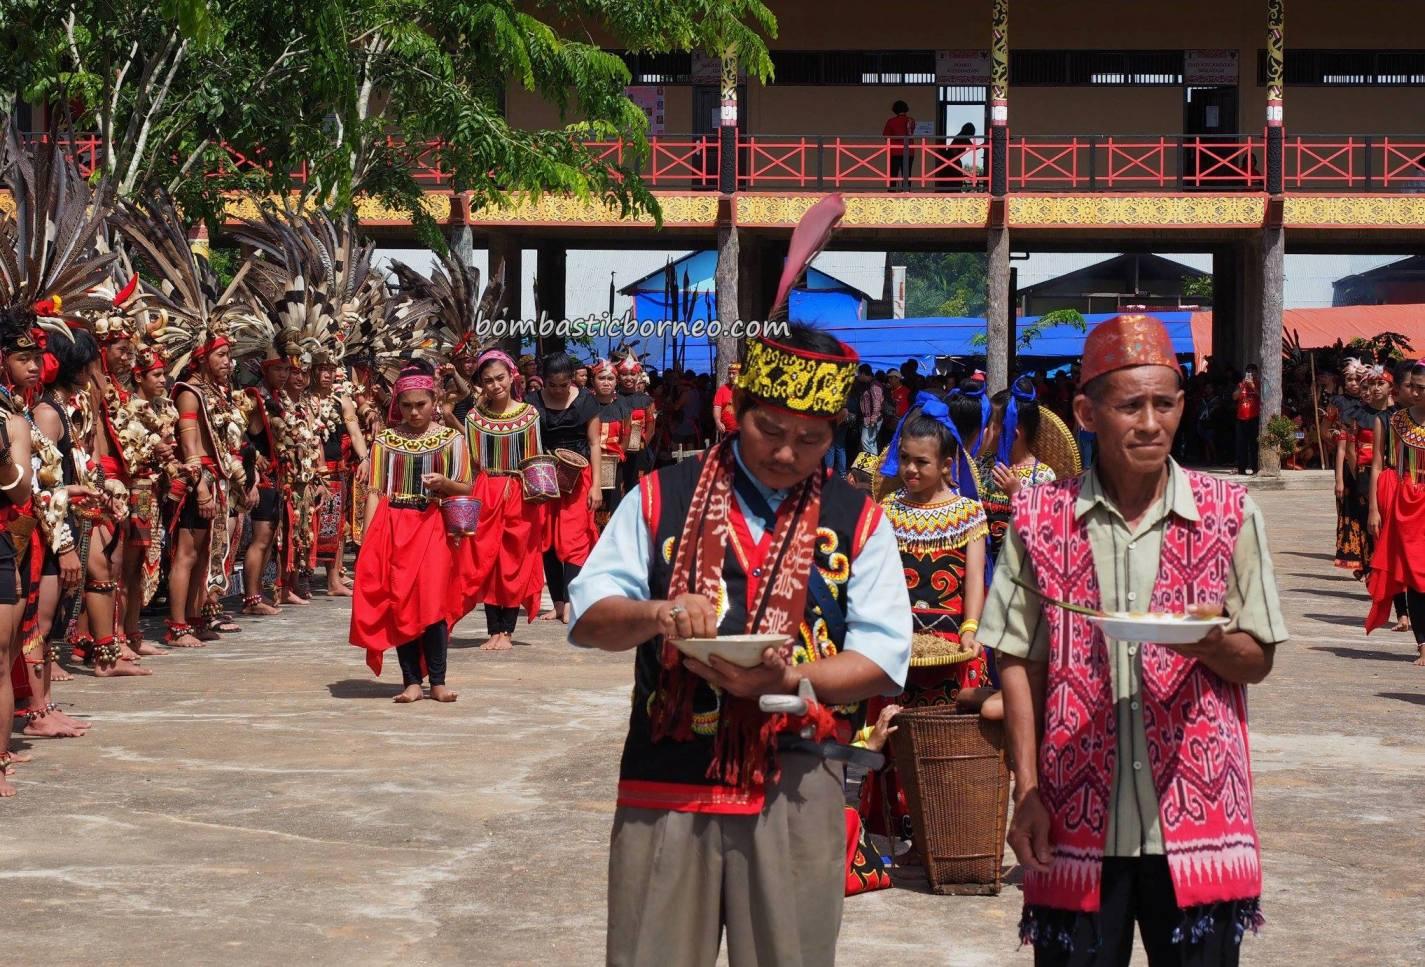 Rumah Betang Raya Dori Mpulor, Dayak Sanggau, Gawai harvest festival, indigenous, backpackers, destination, Kalimantan Barat, ethnic, native, tribe, Tourism, tourist attraction, 西加里曼丹上侯, 达雅克丰收节旅游